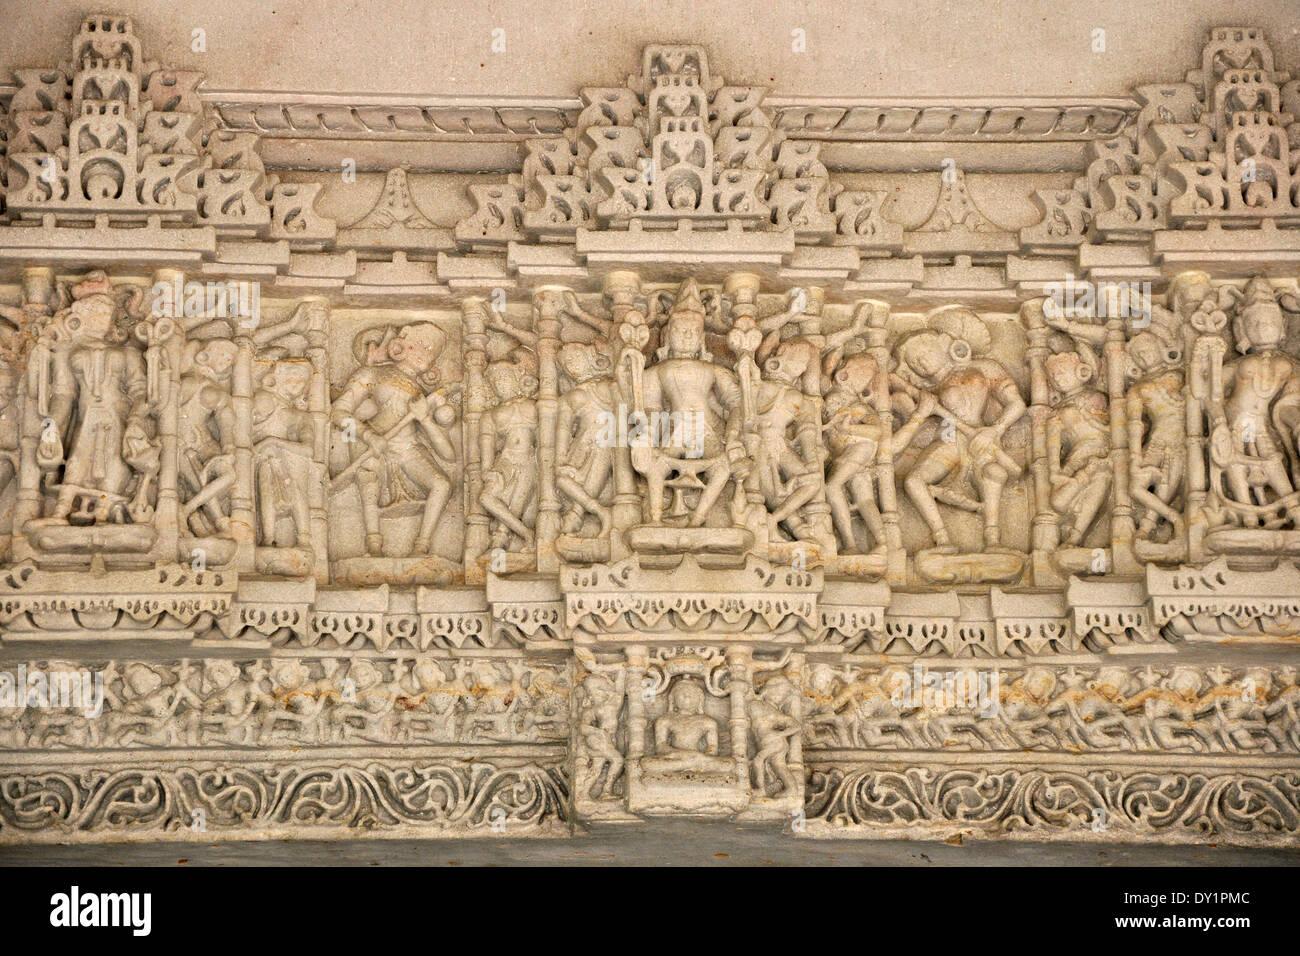 India, Gujarat, Ahmedabad, Swaminarayan Akshardham Temple - Stock Image